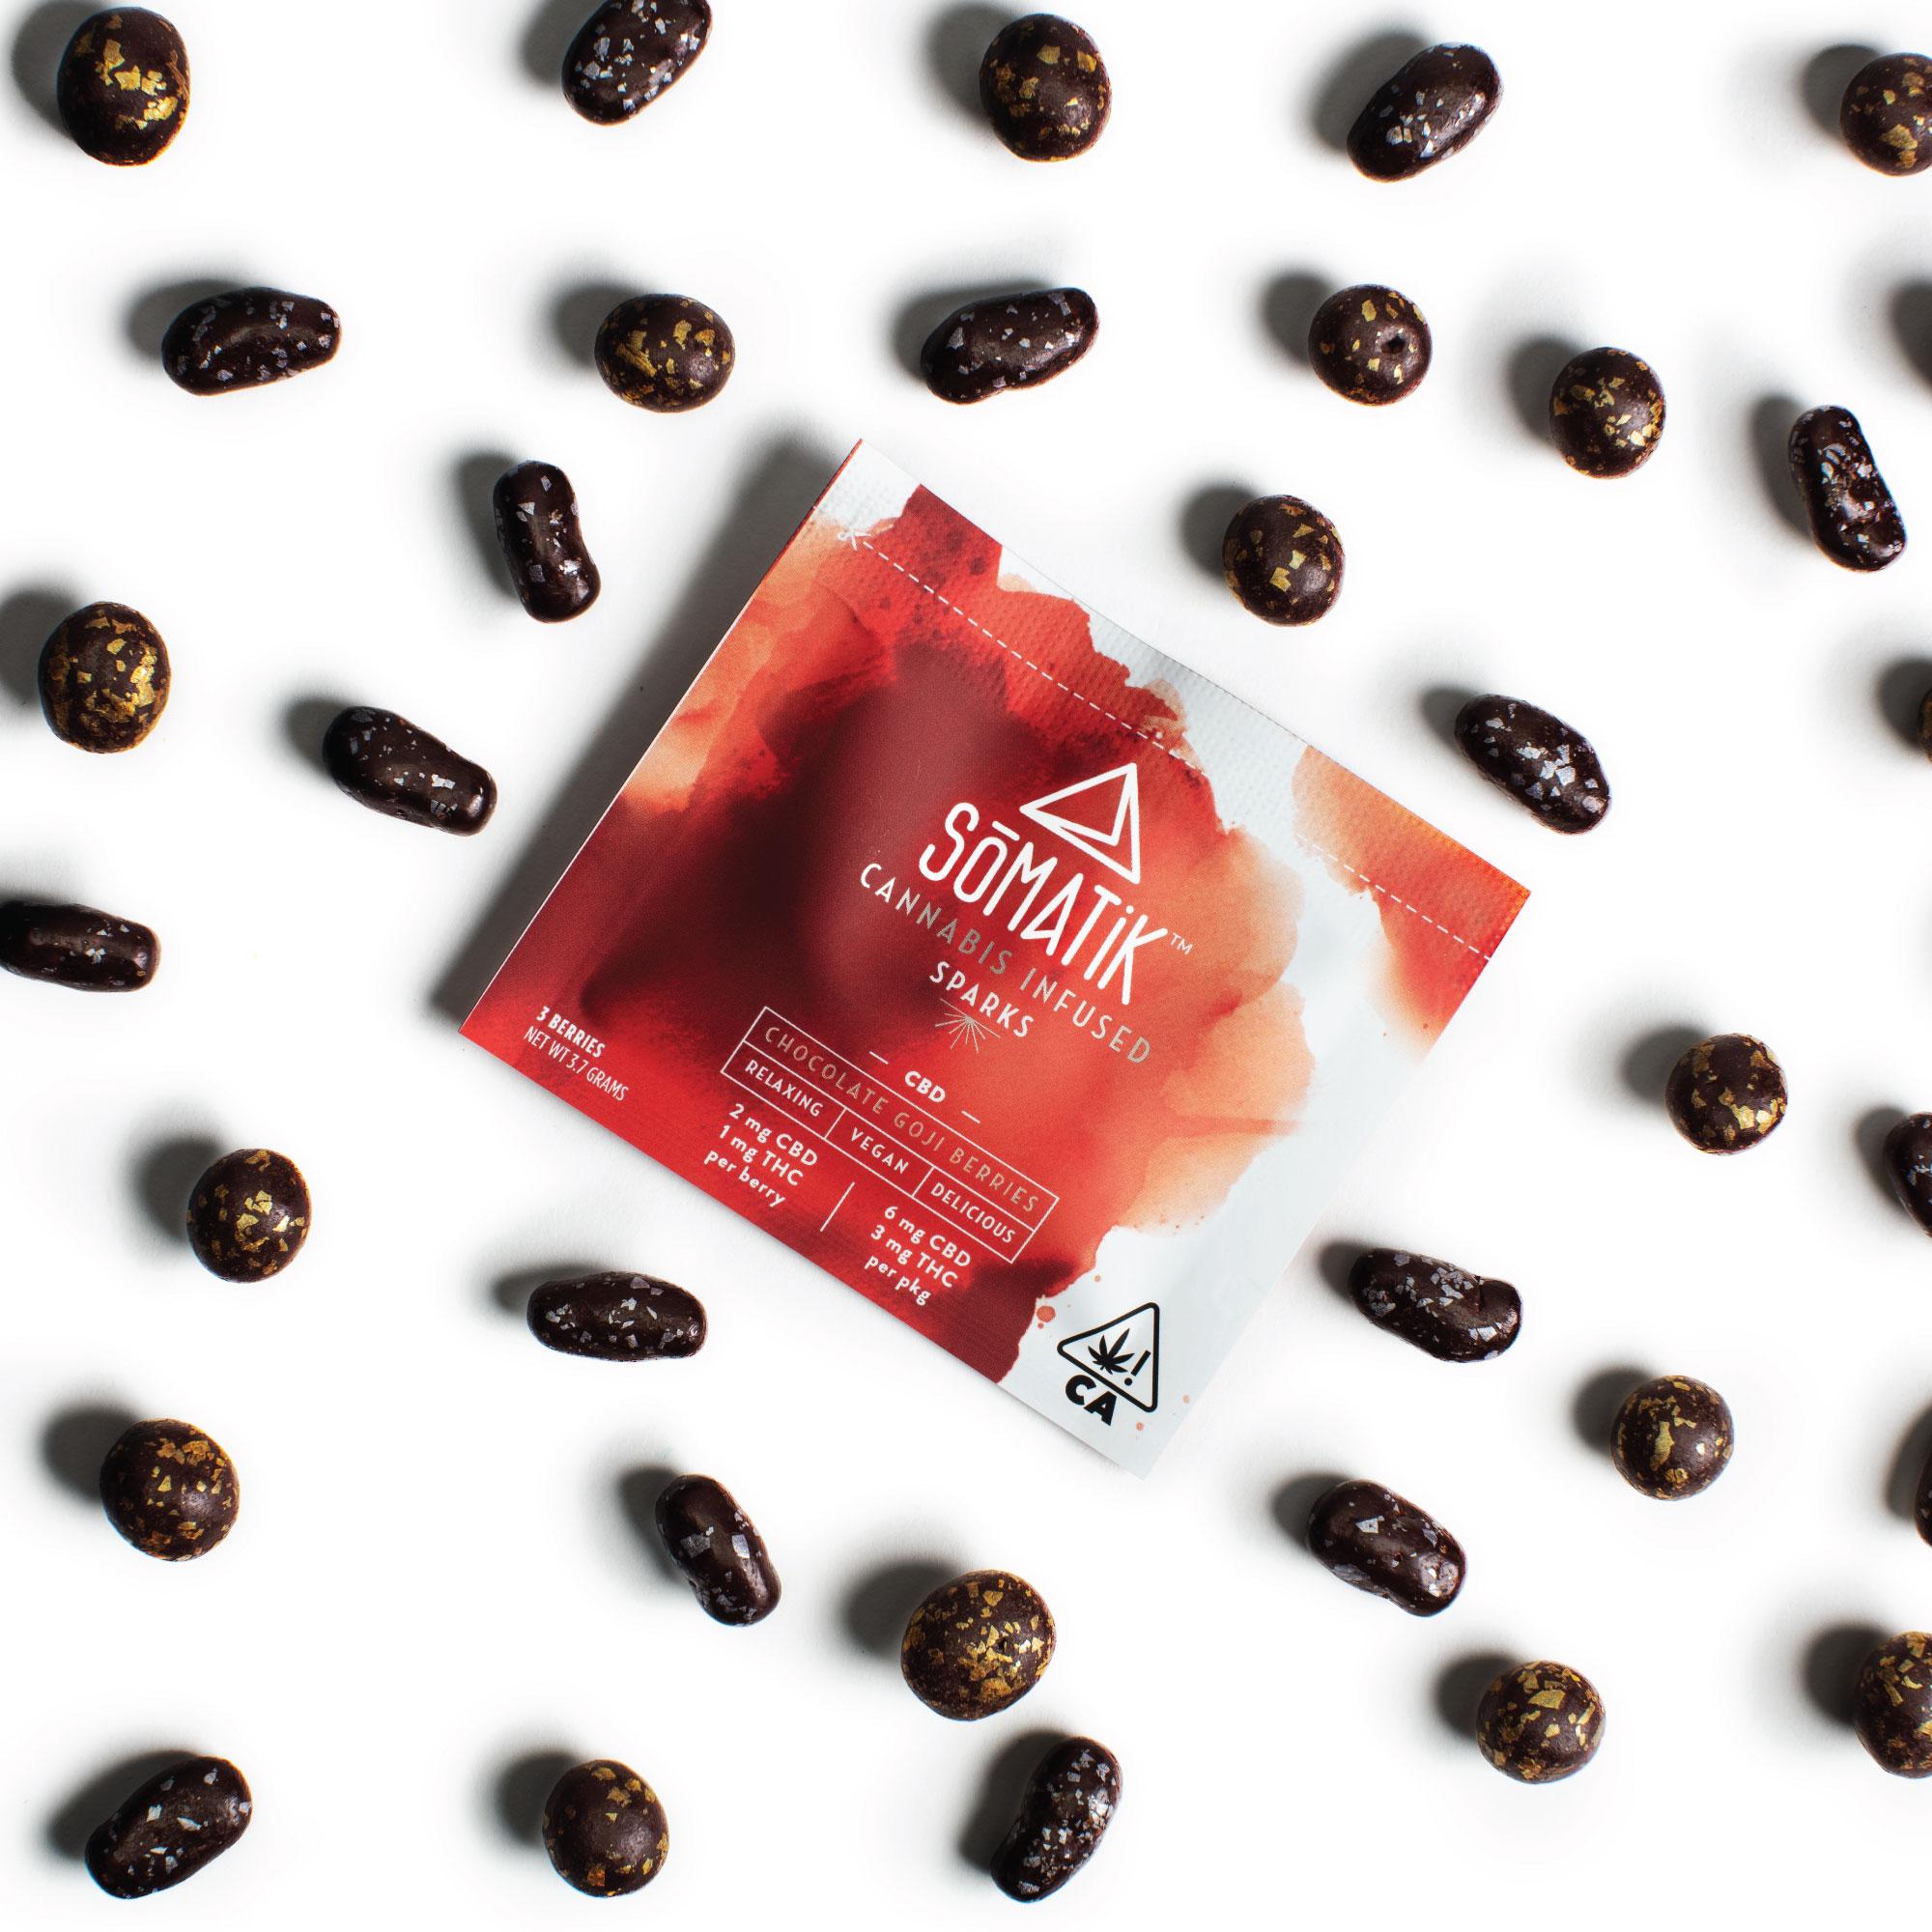 Mini Sparks: CBD Goji Berries| cannabisstores